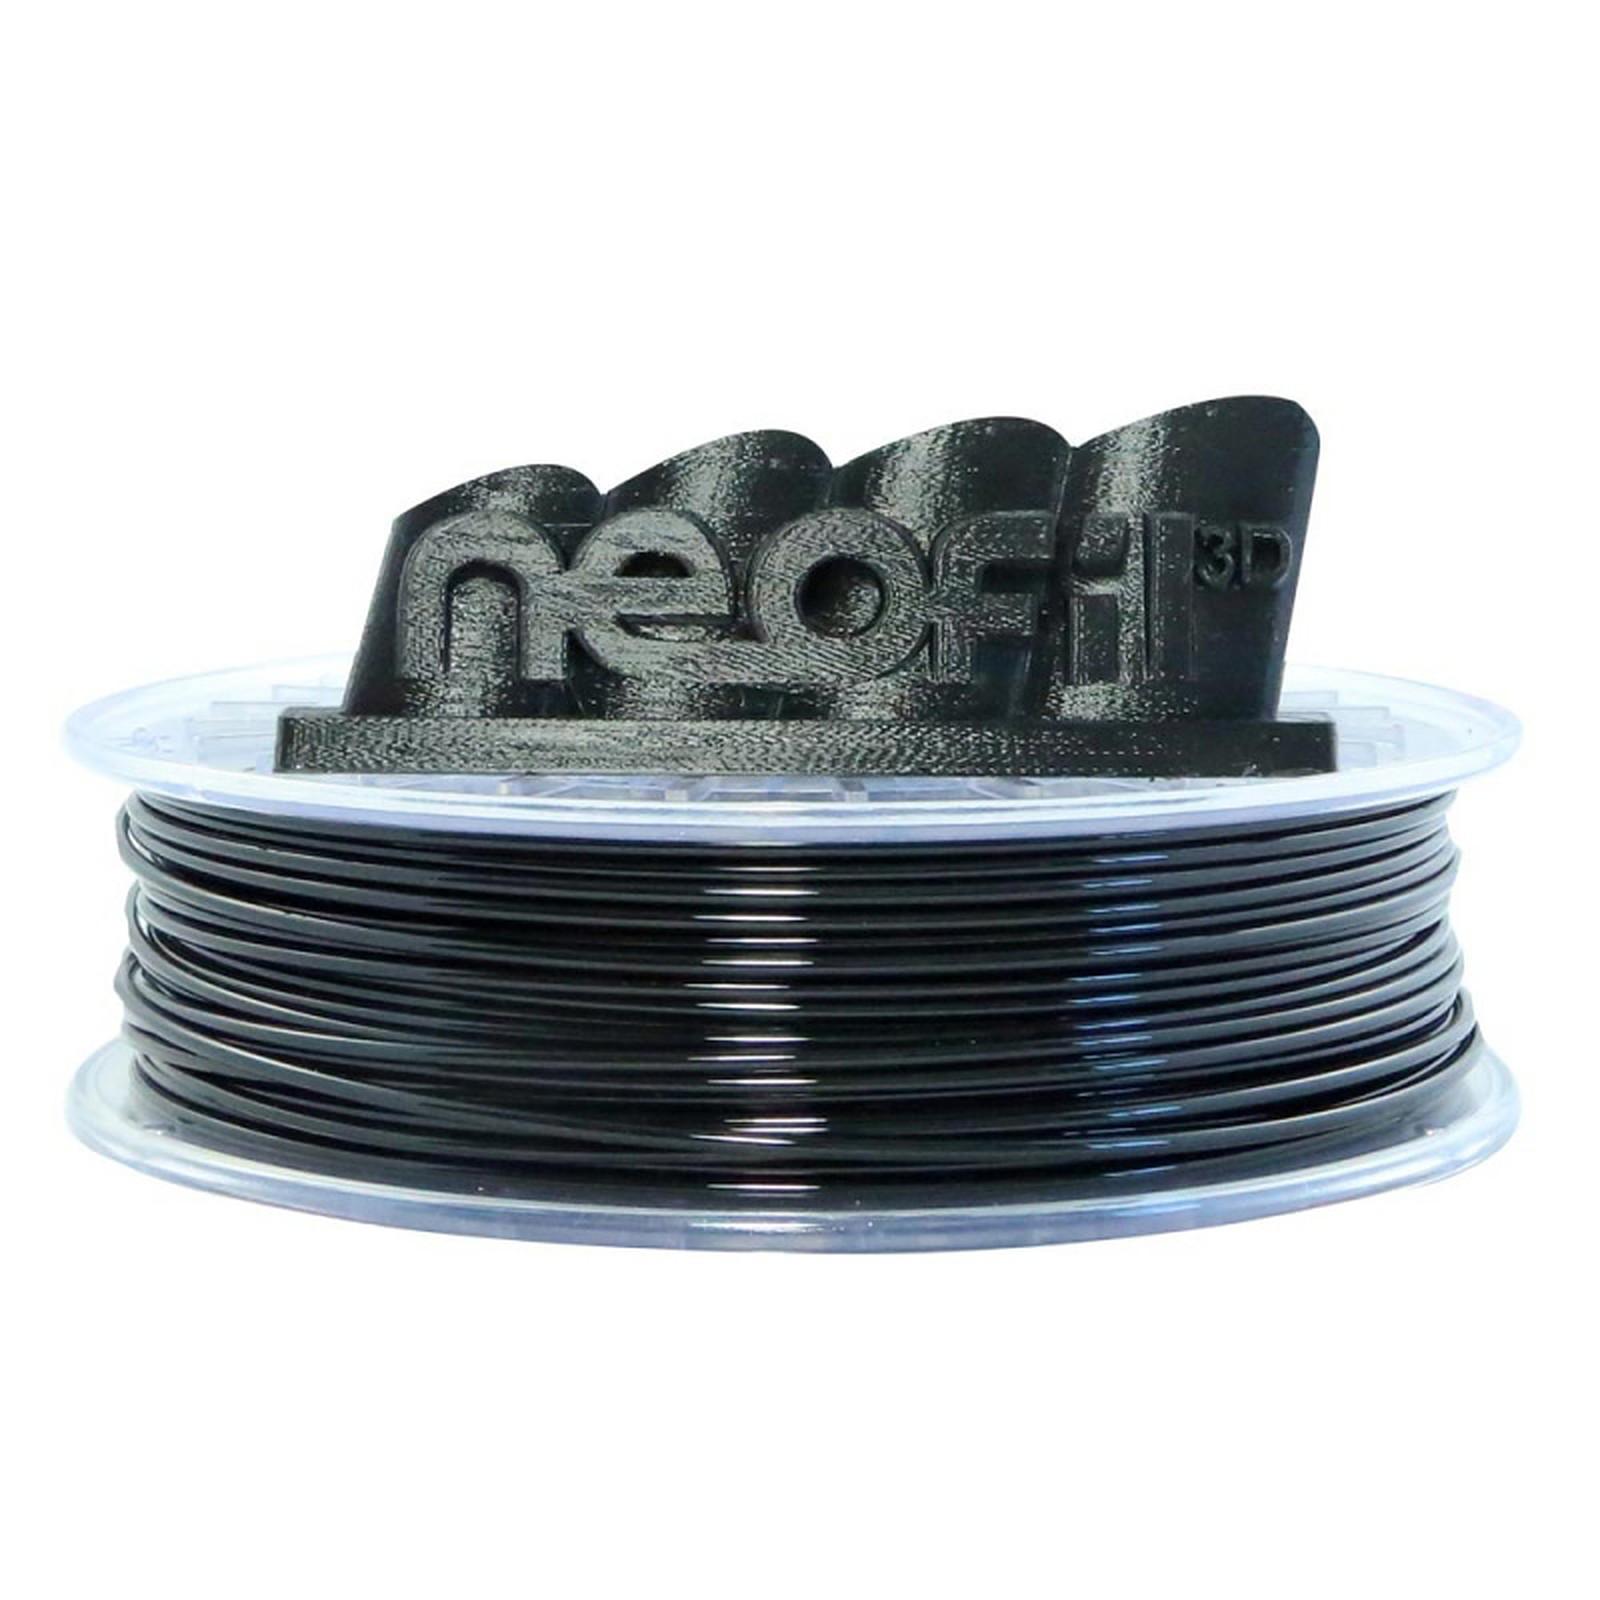 Neofil3D Bobine PET-G 2.85mm 750g - Noir